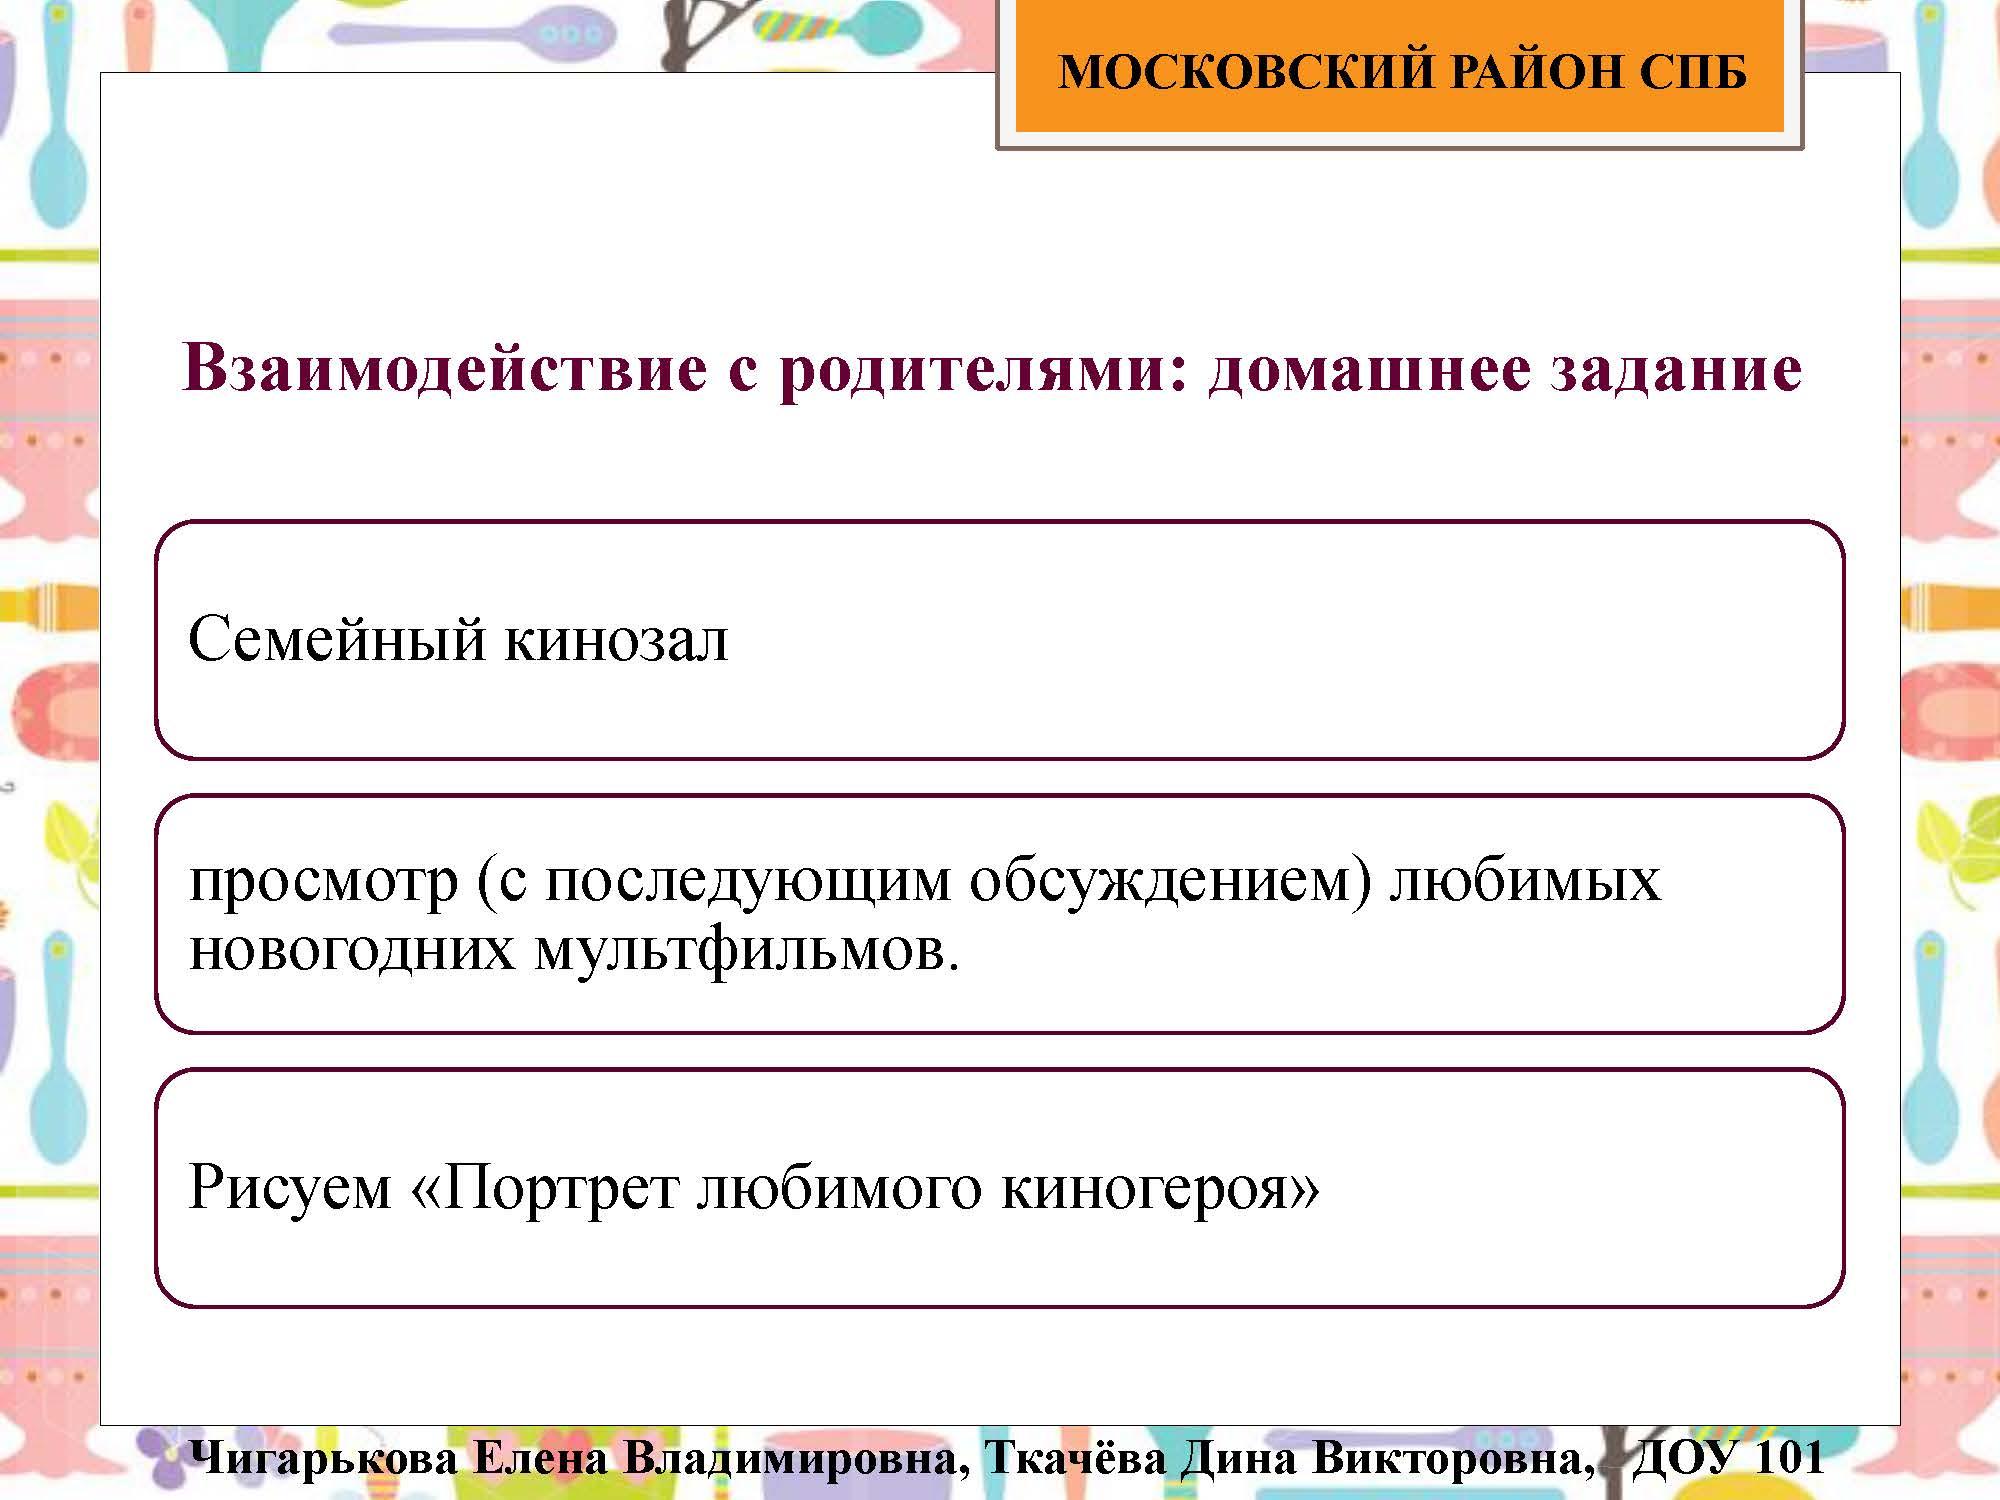 Секция 8. ДОУ 101, ПСИ. Московский район_Страница_19